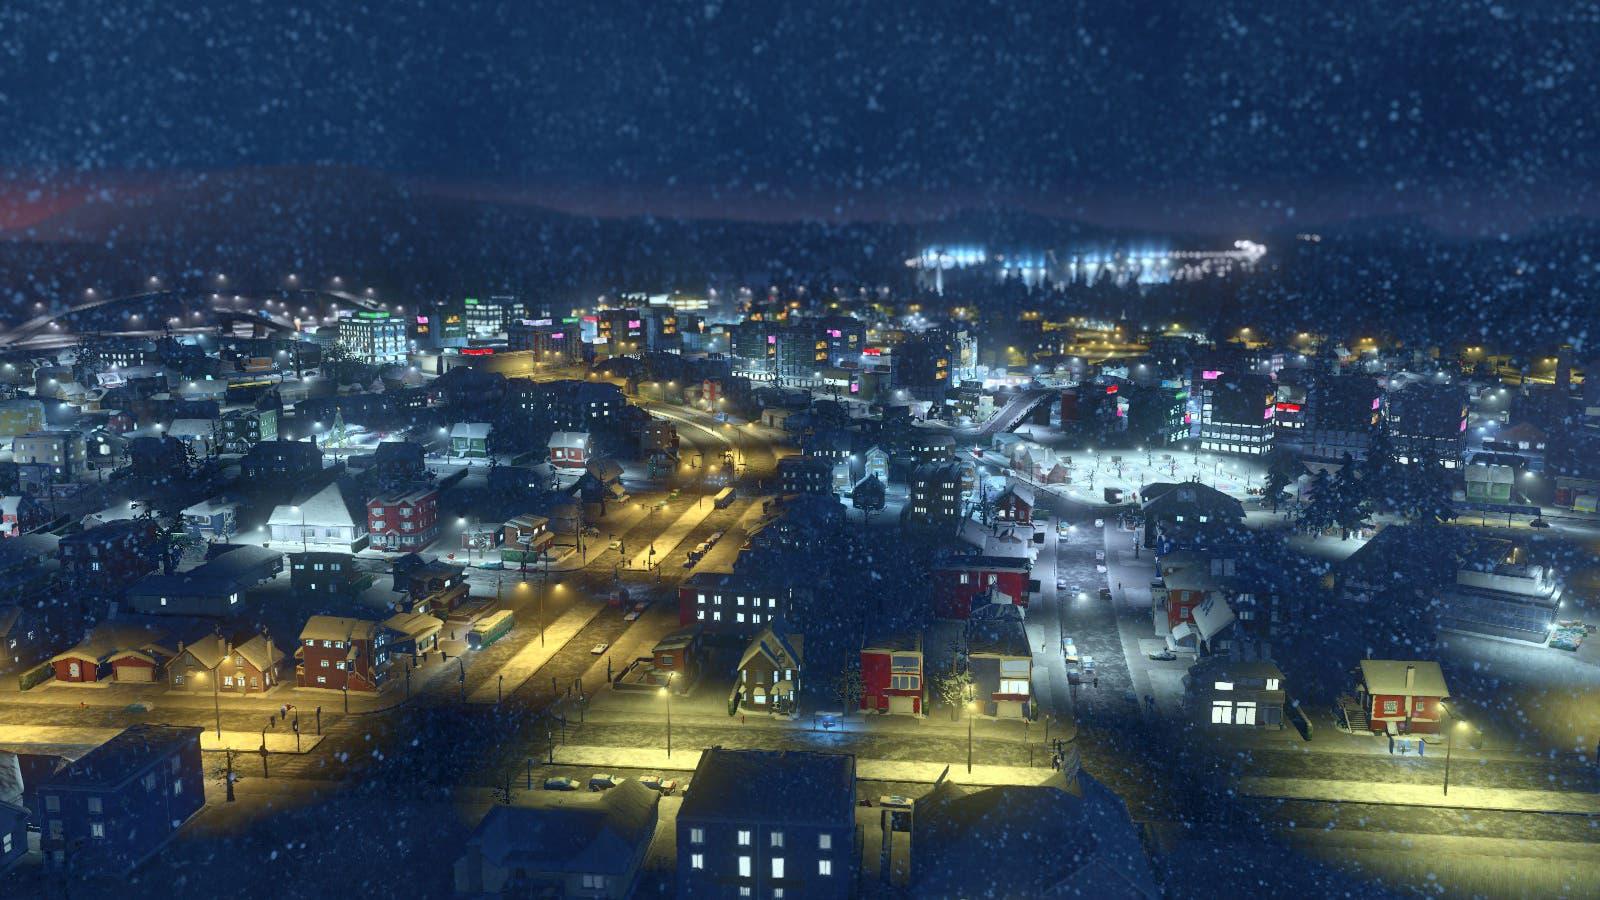 CitiesSkylinesSnowfall-review2